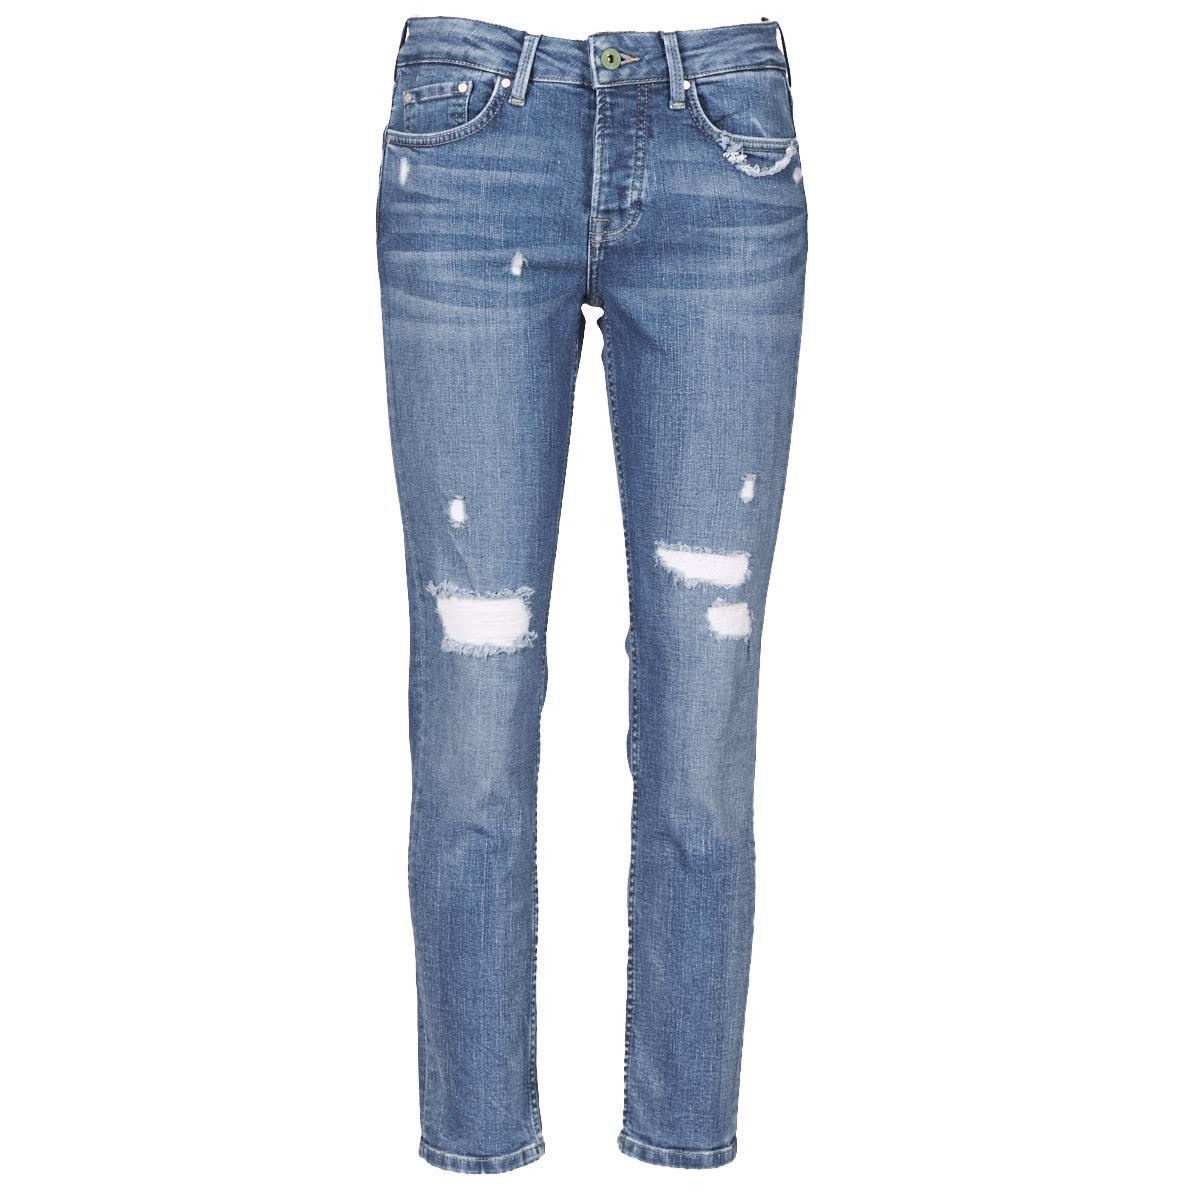 Pepe Jeans Denim Jolie Eco Jeans in Blue